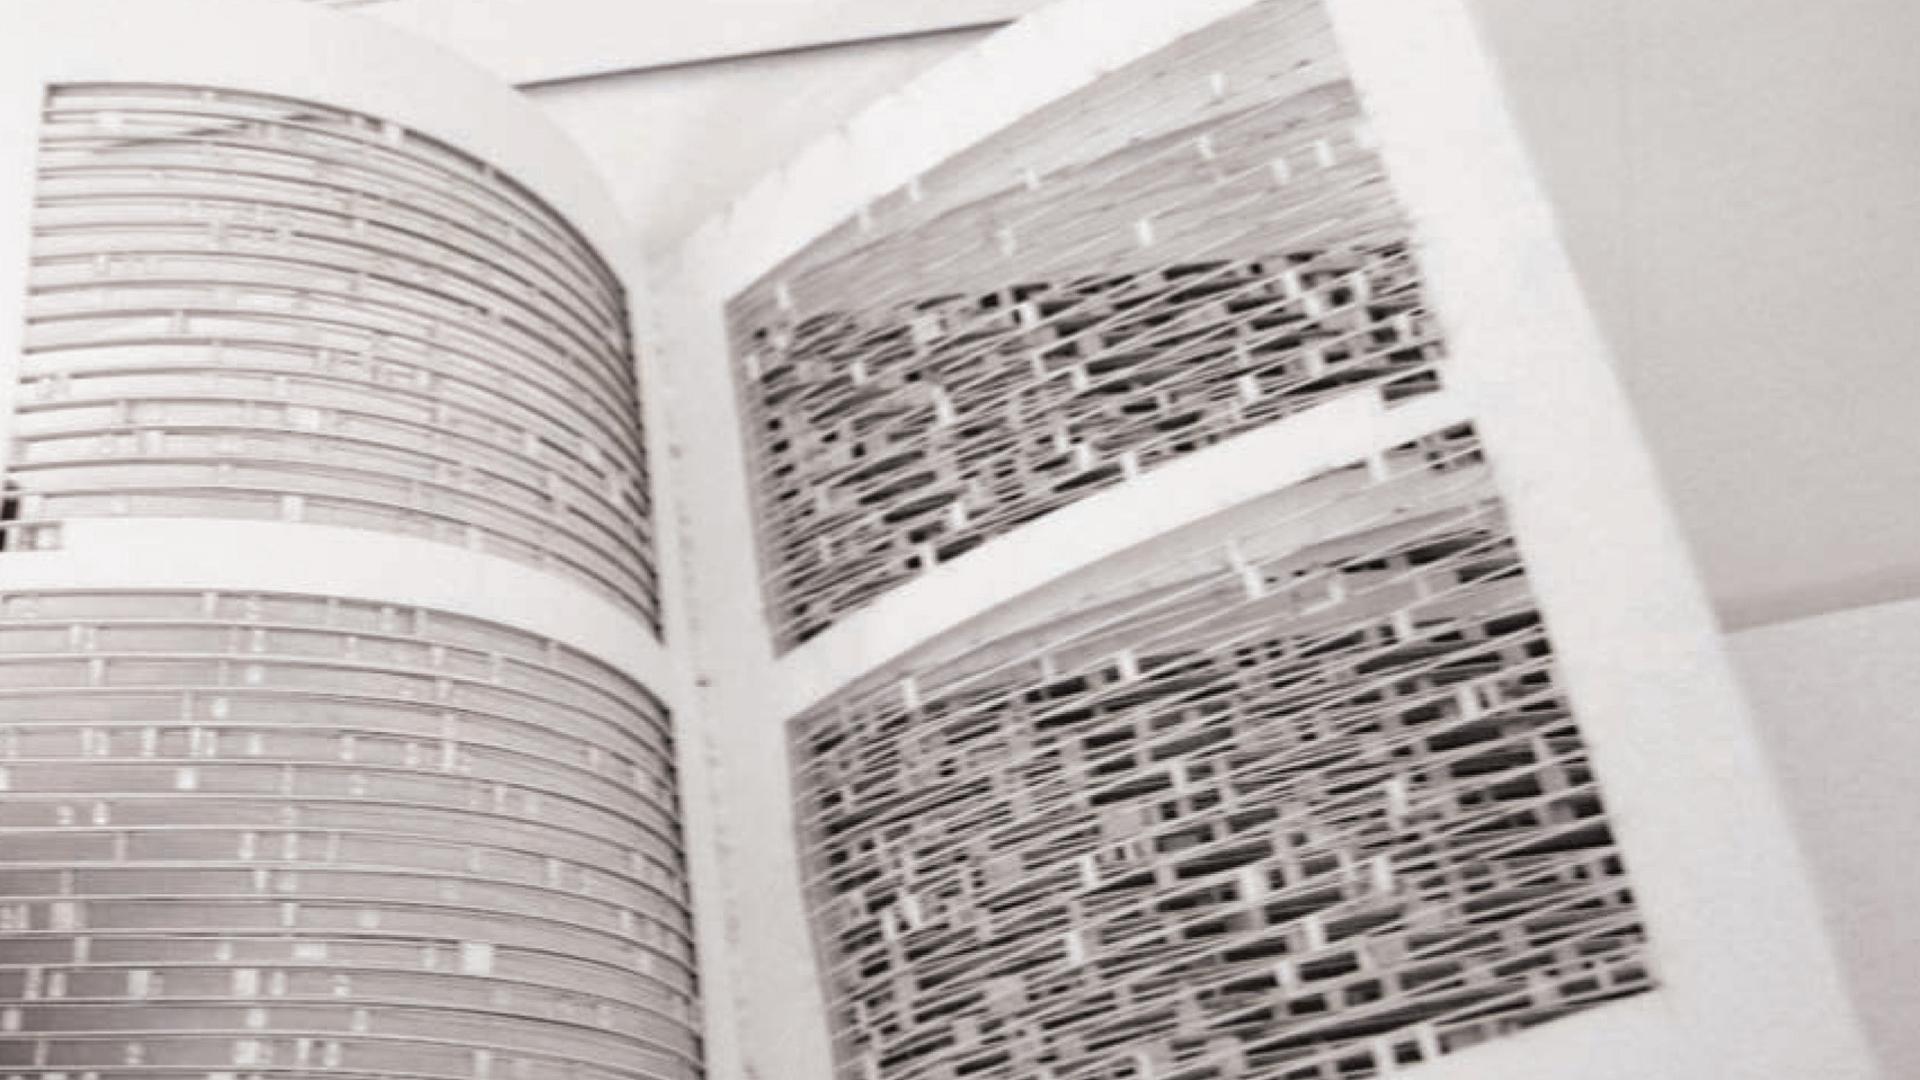 umetnikova-knjiga-cover-1